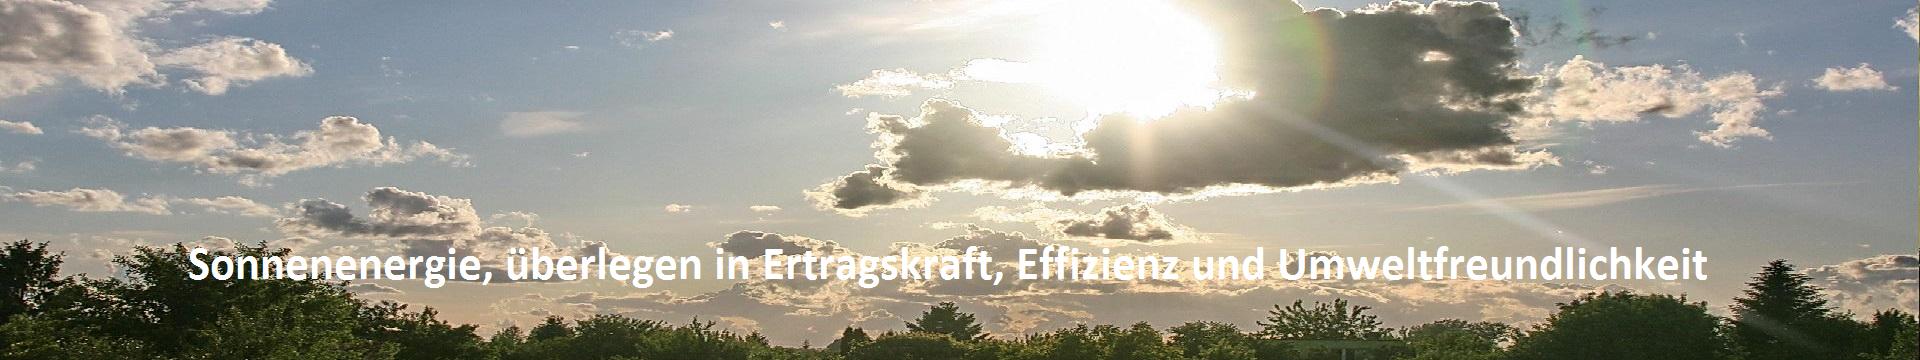 "Zur  Webseite ""solarstromgarage.de"""